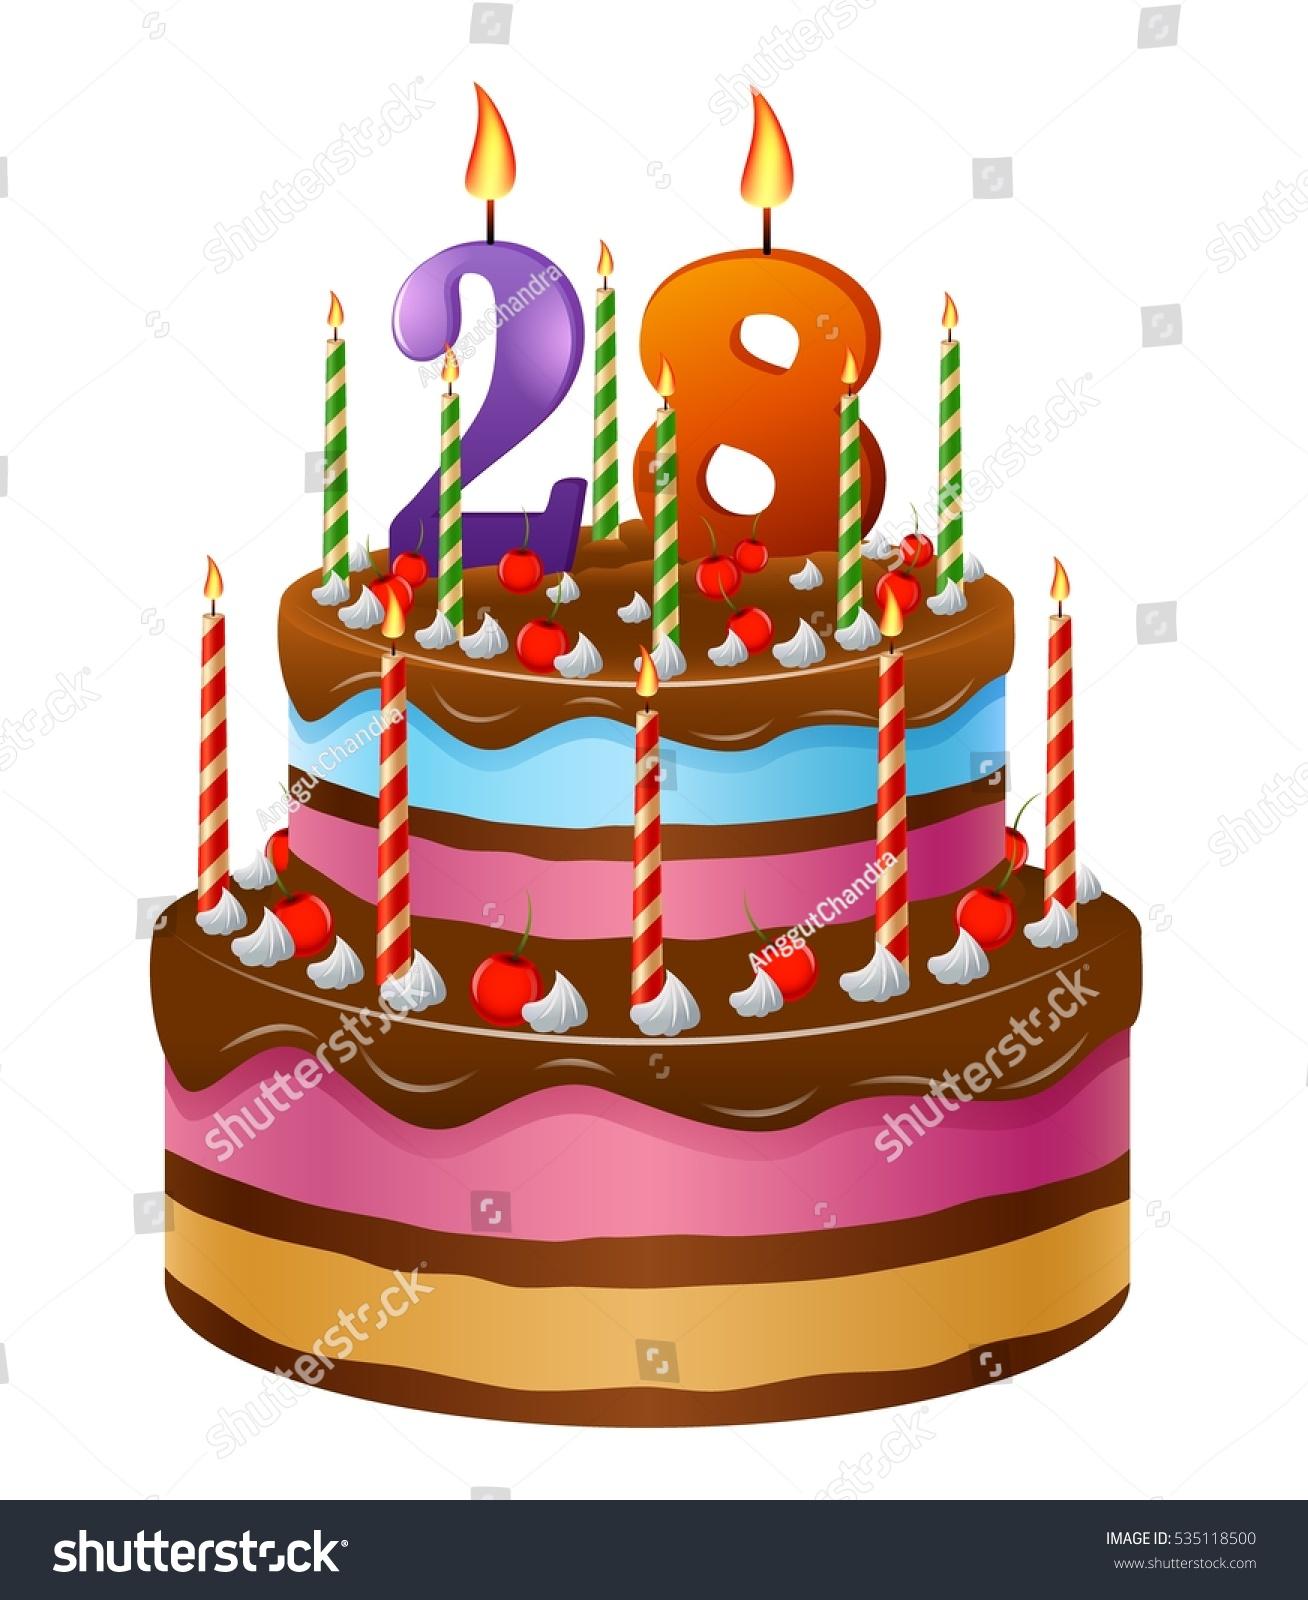 Miraculous Happy Birthday Cake 28 Stock Vector Royalty Free 535118500 Birthday Cards Printable Inklcafe Filternl